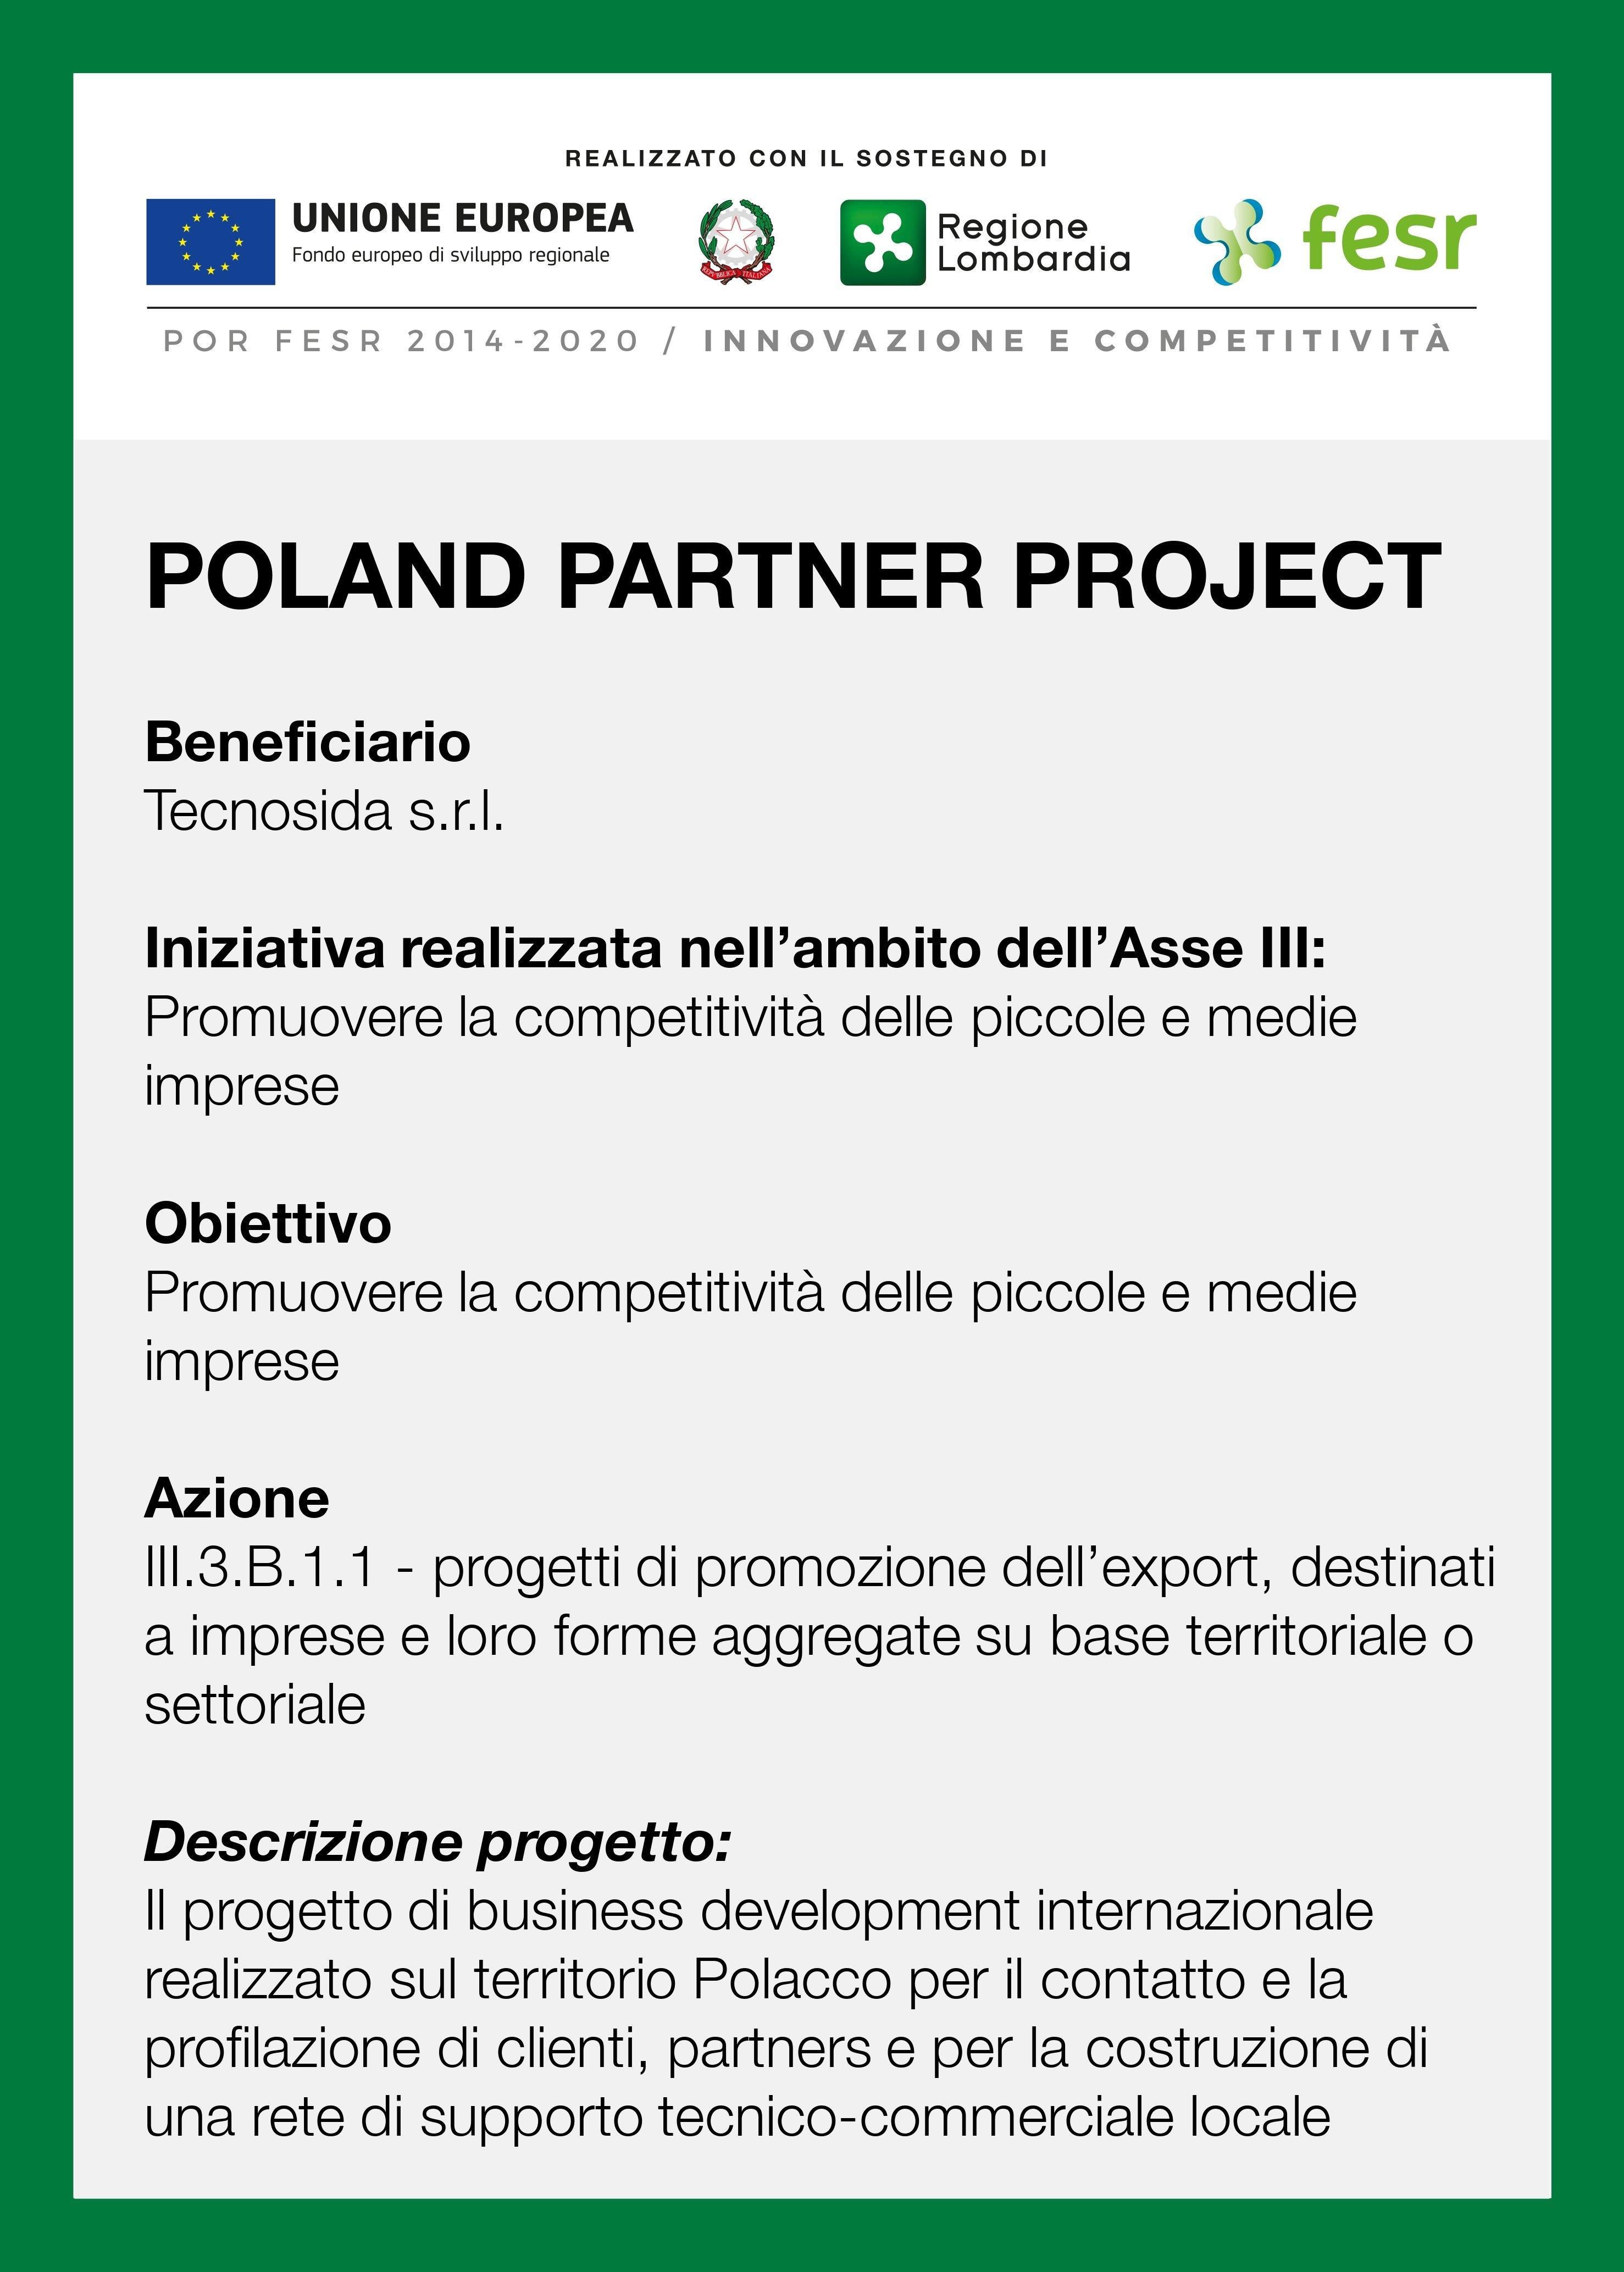 Poland partner project